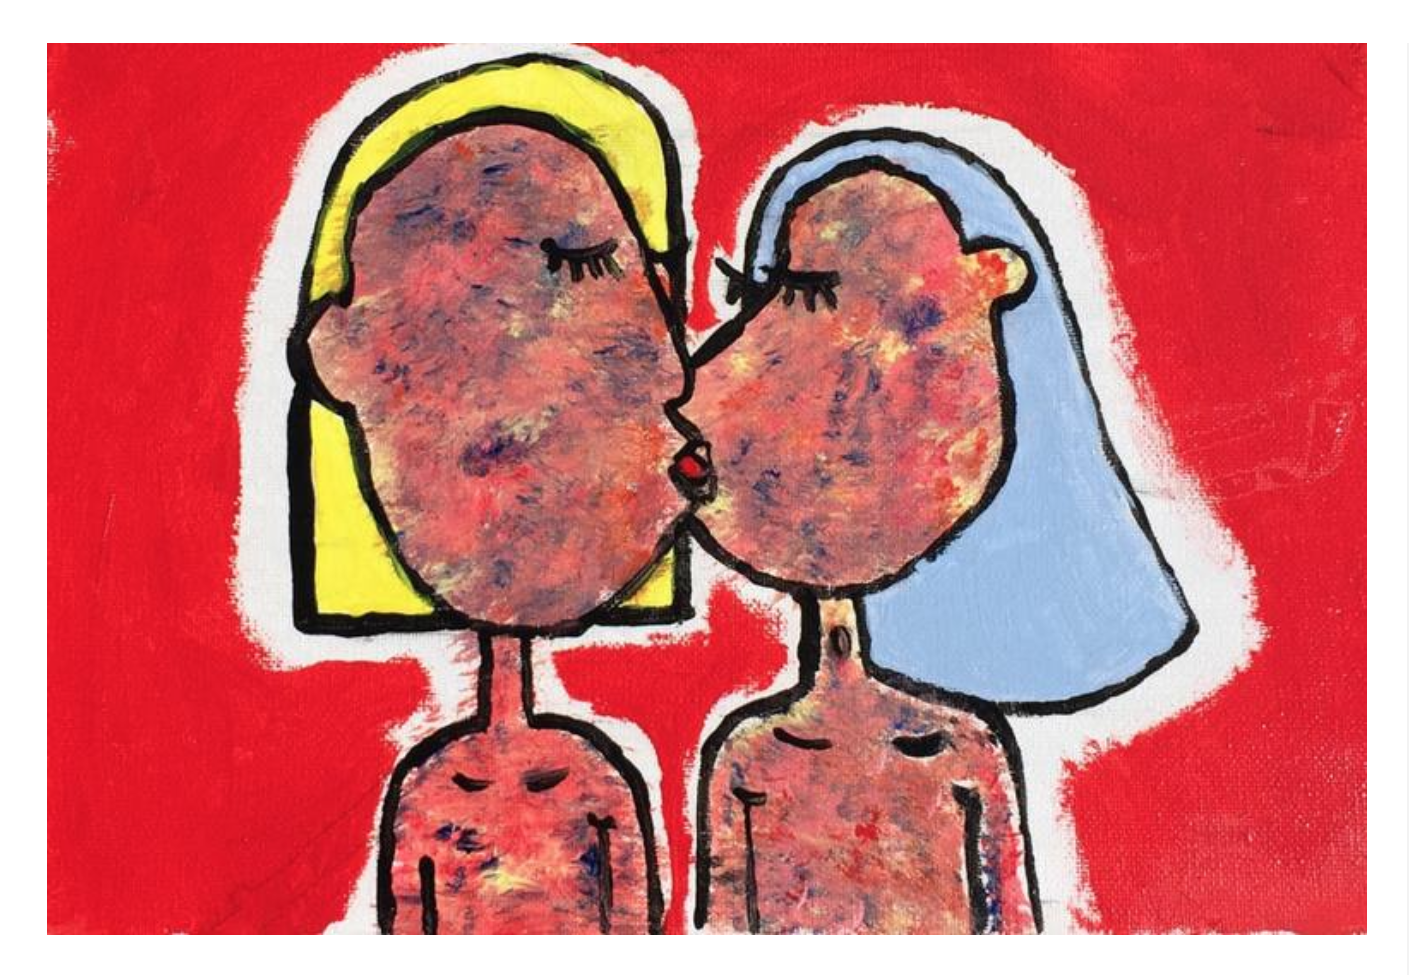 One Love by Cydne Smith